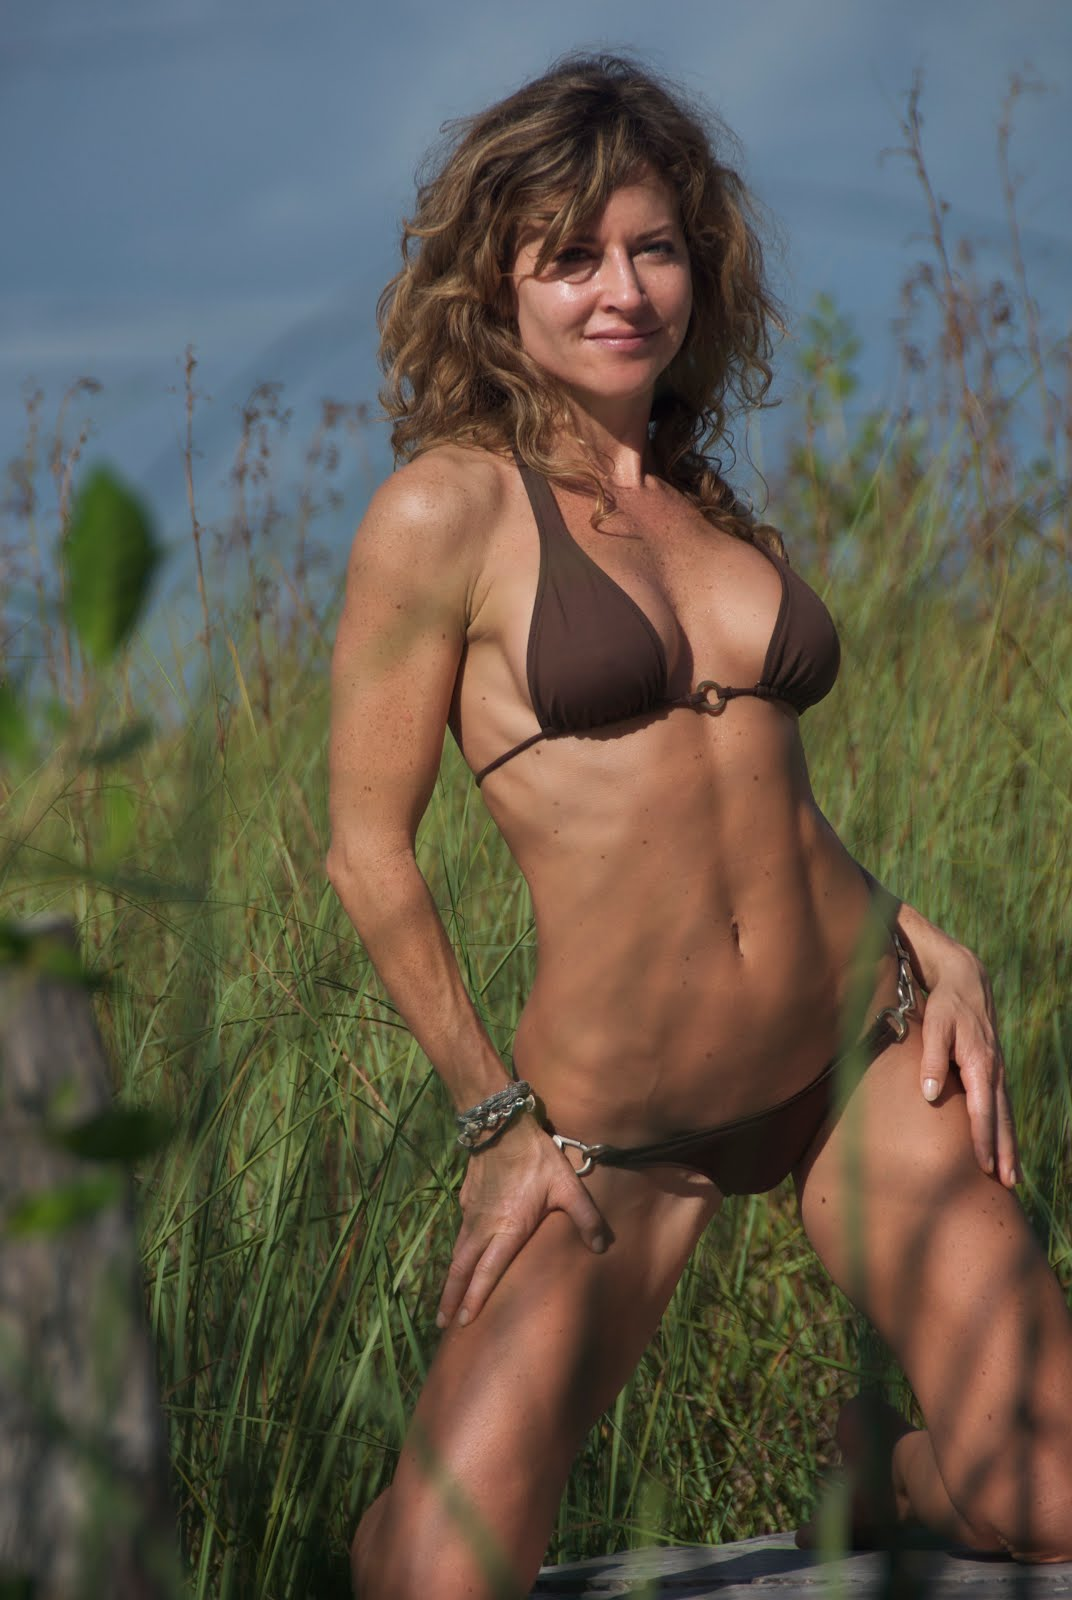 Older Fitness Models : older, fitness, models, Weights…